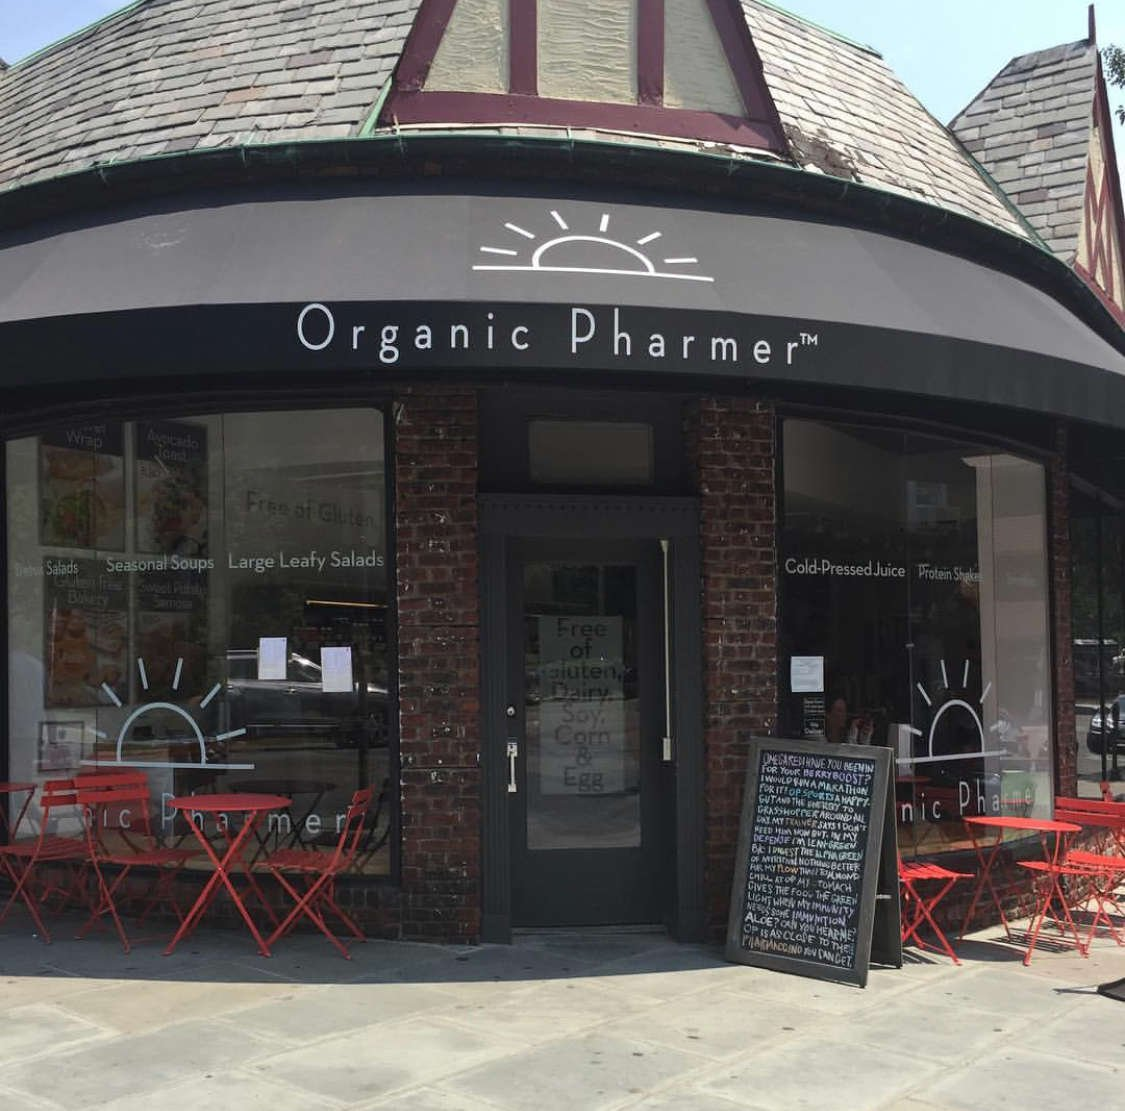 organic pharmer in scarsdale new york on garth road